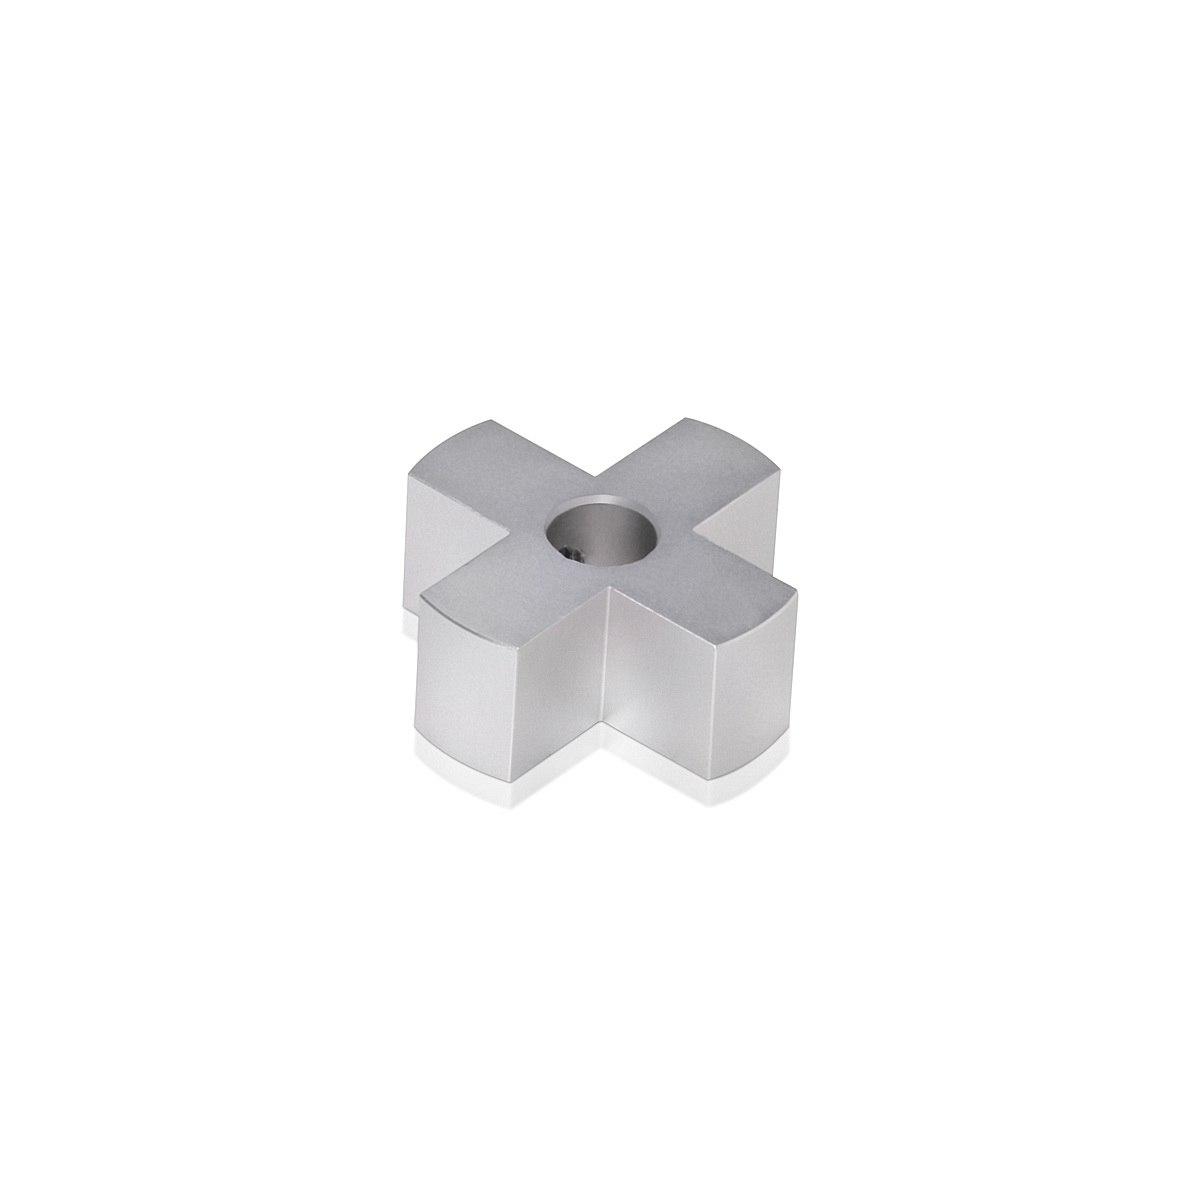 4-Way Standoffs Hub, Diameter: 1 1/4'', Thickness: 1/2'', Clear Anodized Aluminum